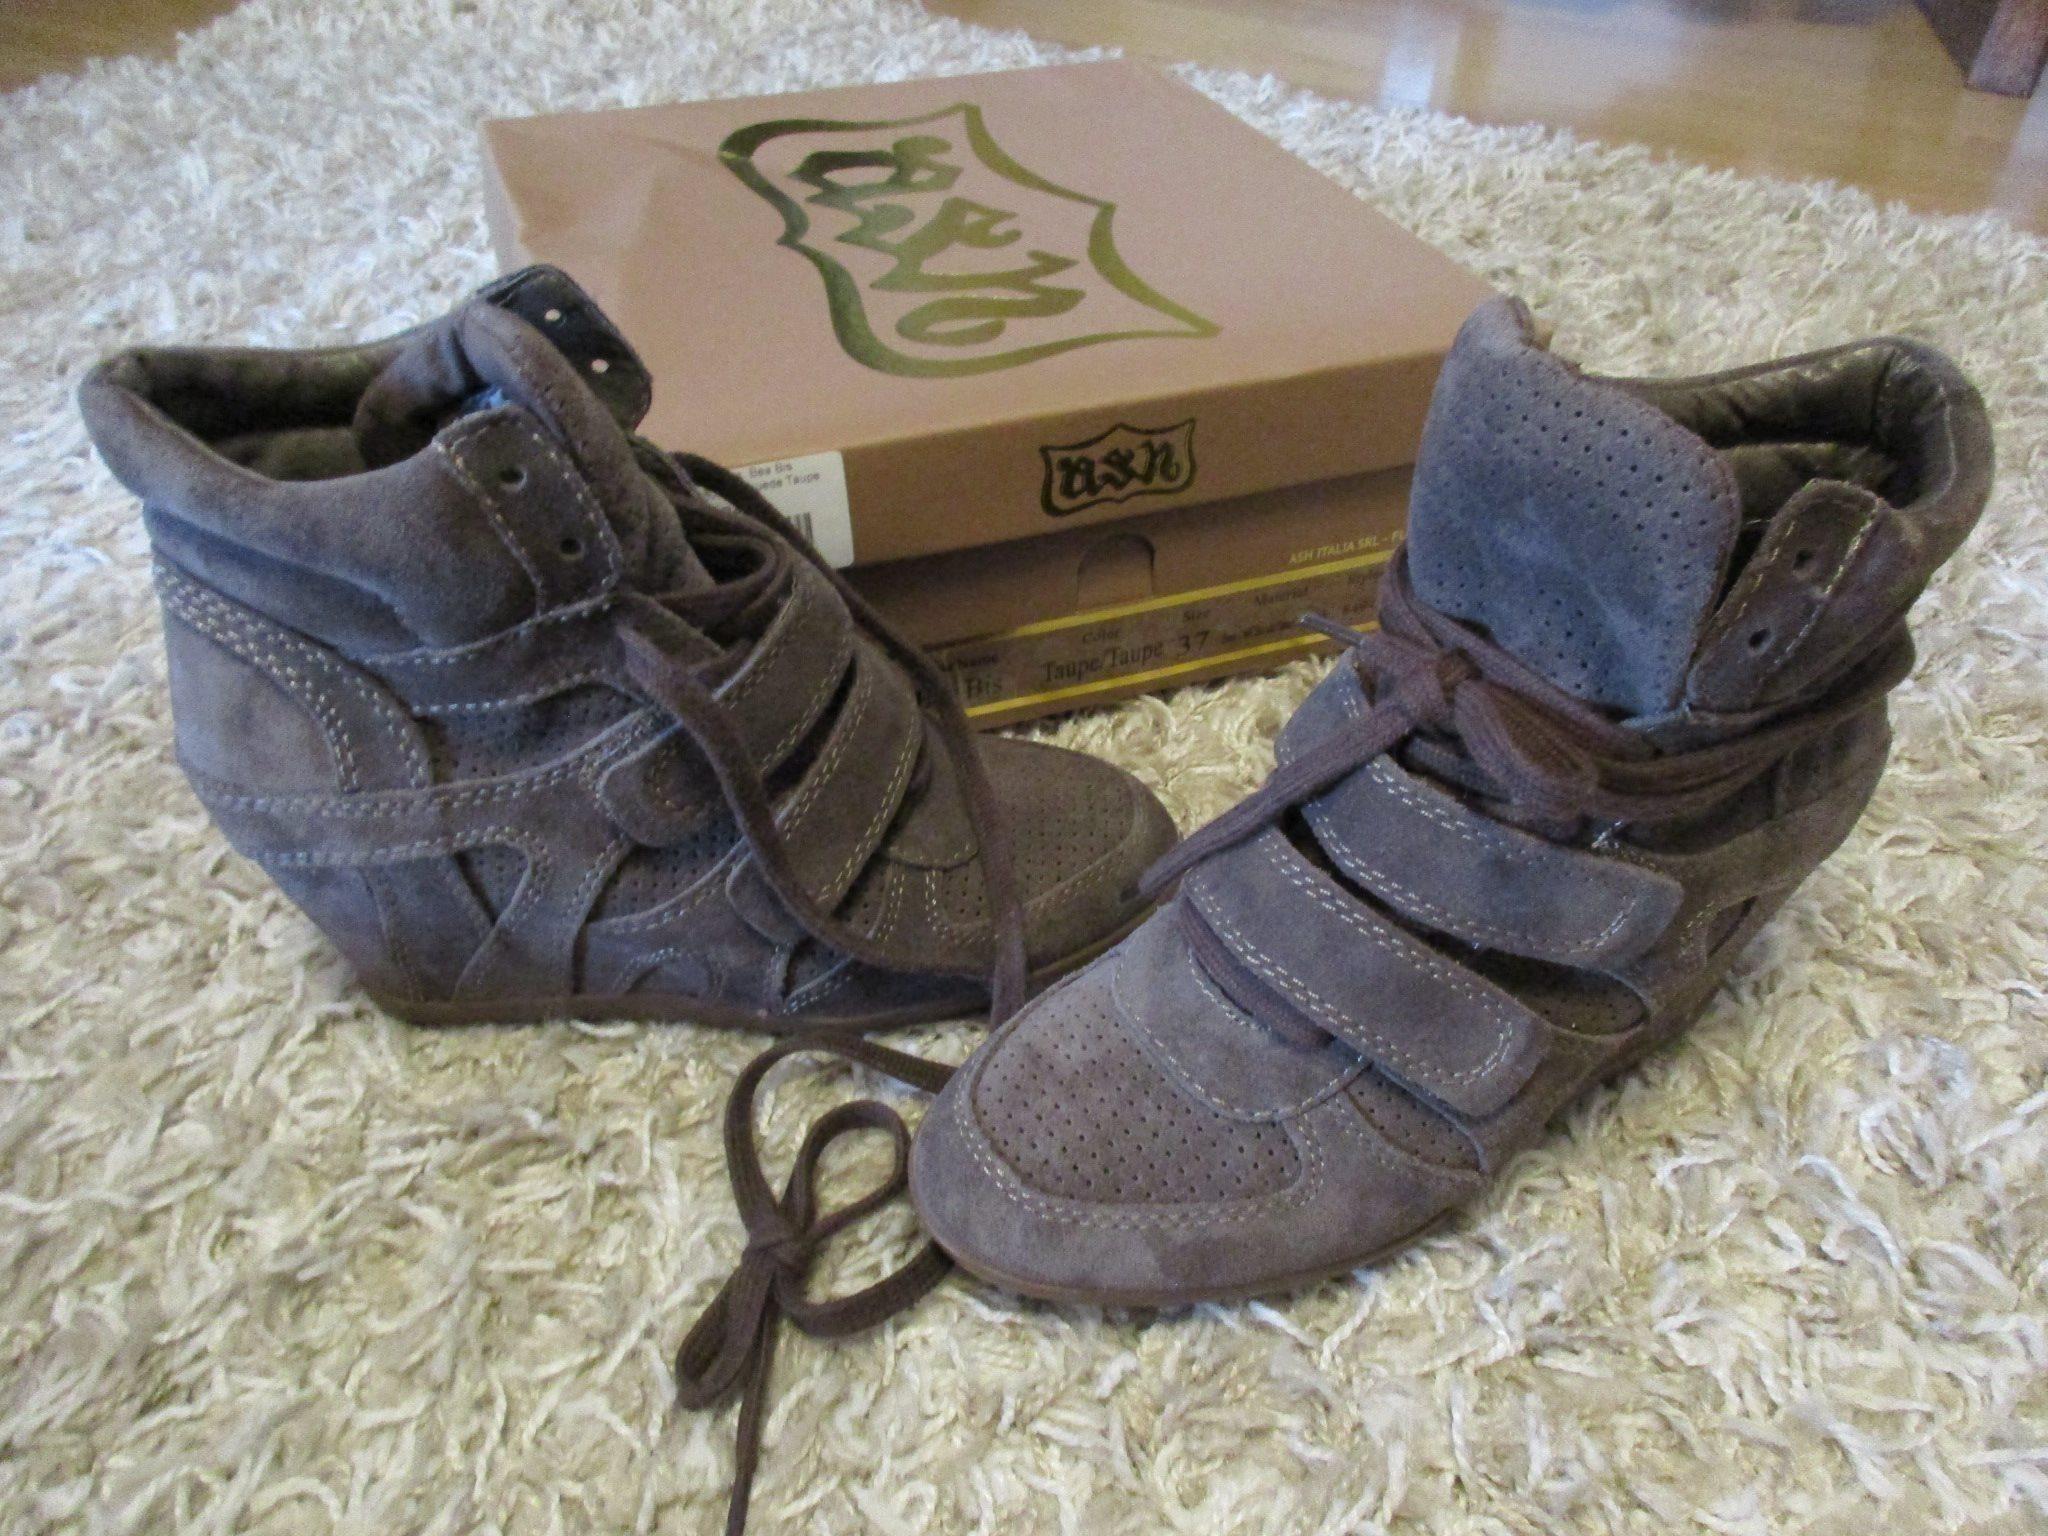 980ed6fd4a3 ASH sneakers Bea Bis storlek 37 som nya (343986220) ᐈ Köp på Tradera